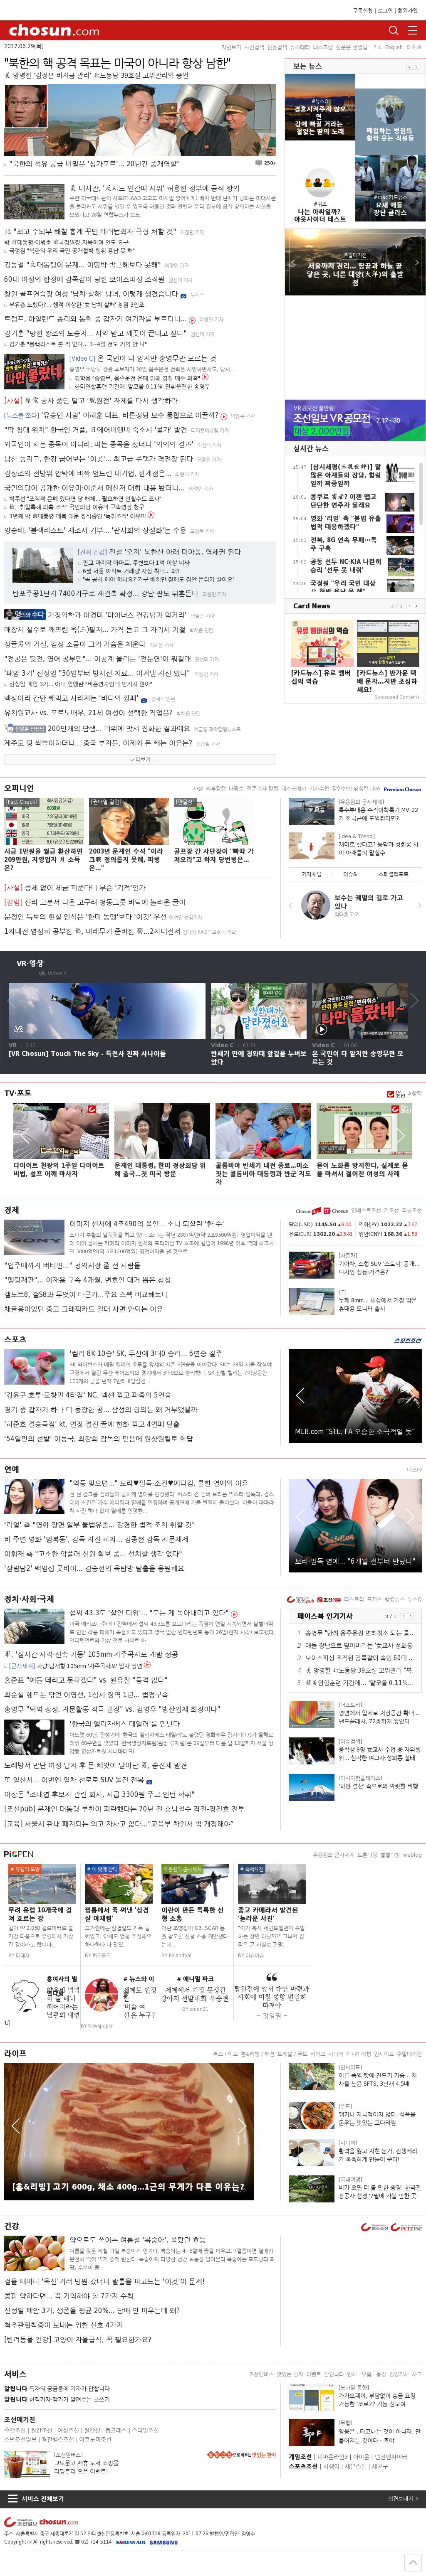 chosun.com at Wednesday June 28, 2017, 6:02 p.m. UTC